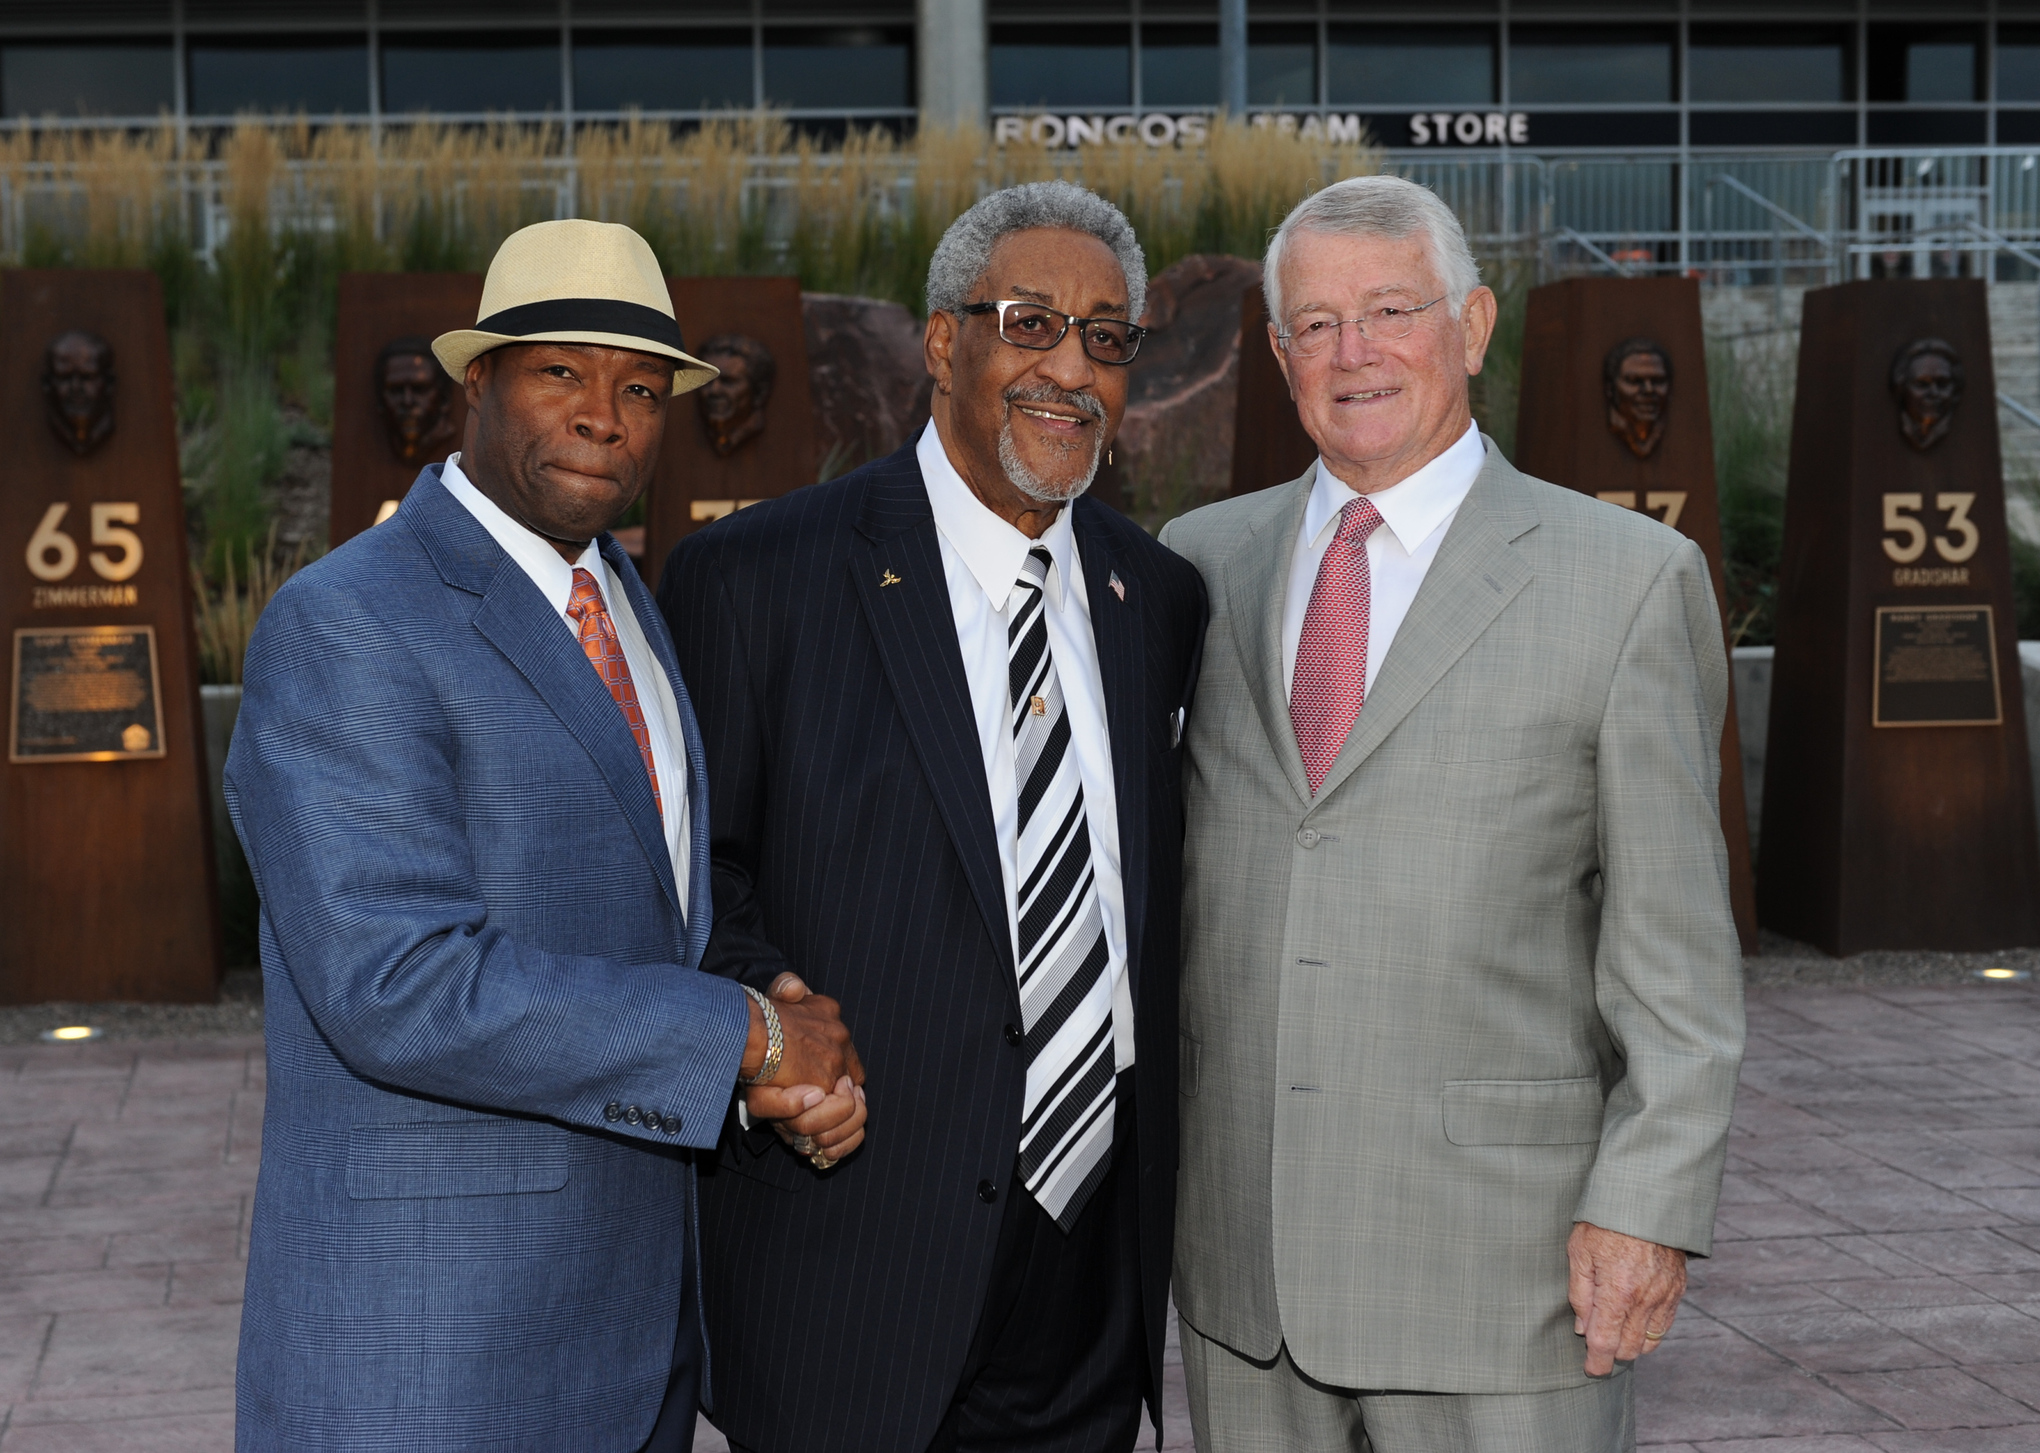 Broncos 2014 Ring of Fame inductees Rick Upchurch, Gene Mingo, and Dan Reeves.